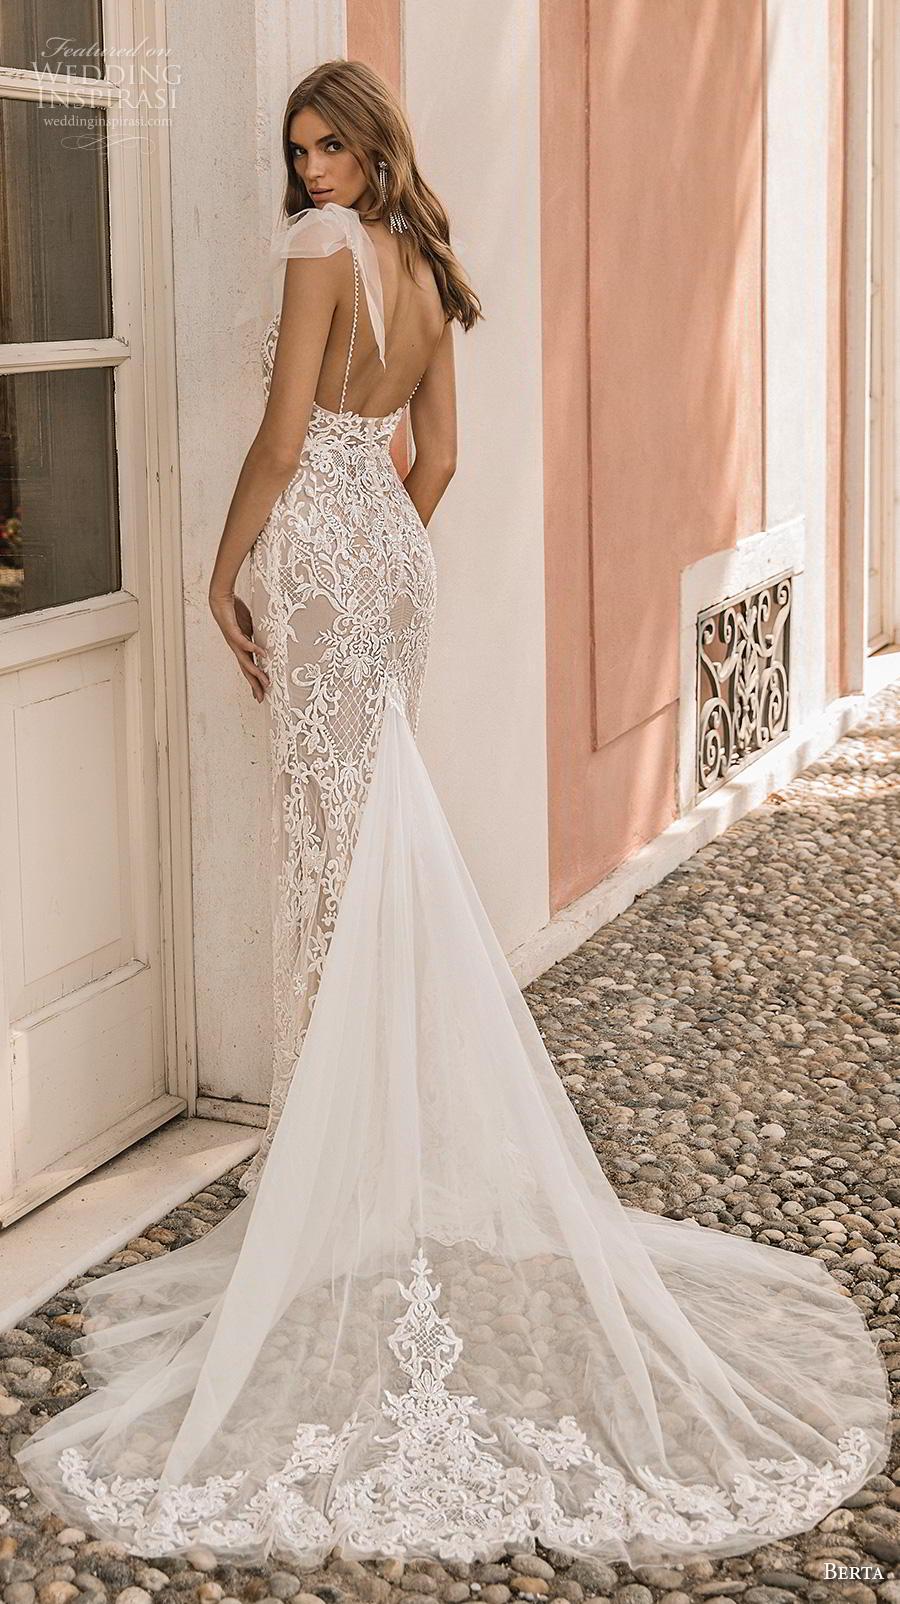 berta 2019 privee bridal thin strap diamond neck full embellishment elegant glamorous sheath wedding dress backless chapel train (5) bv